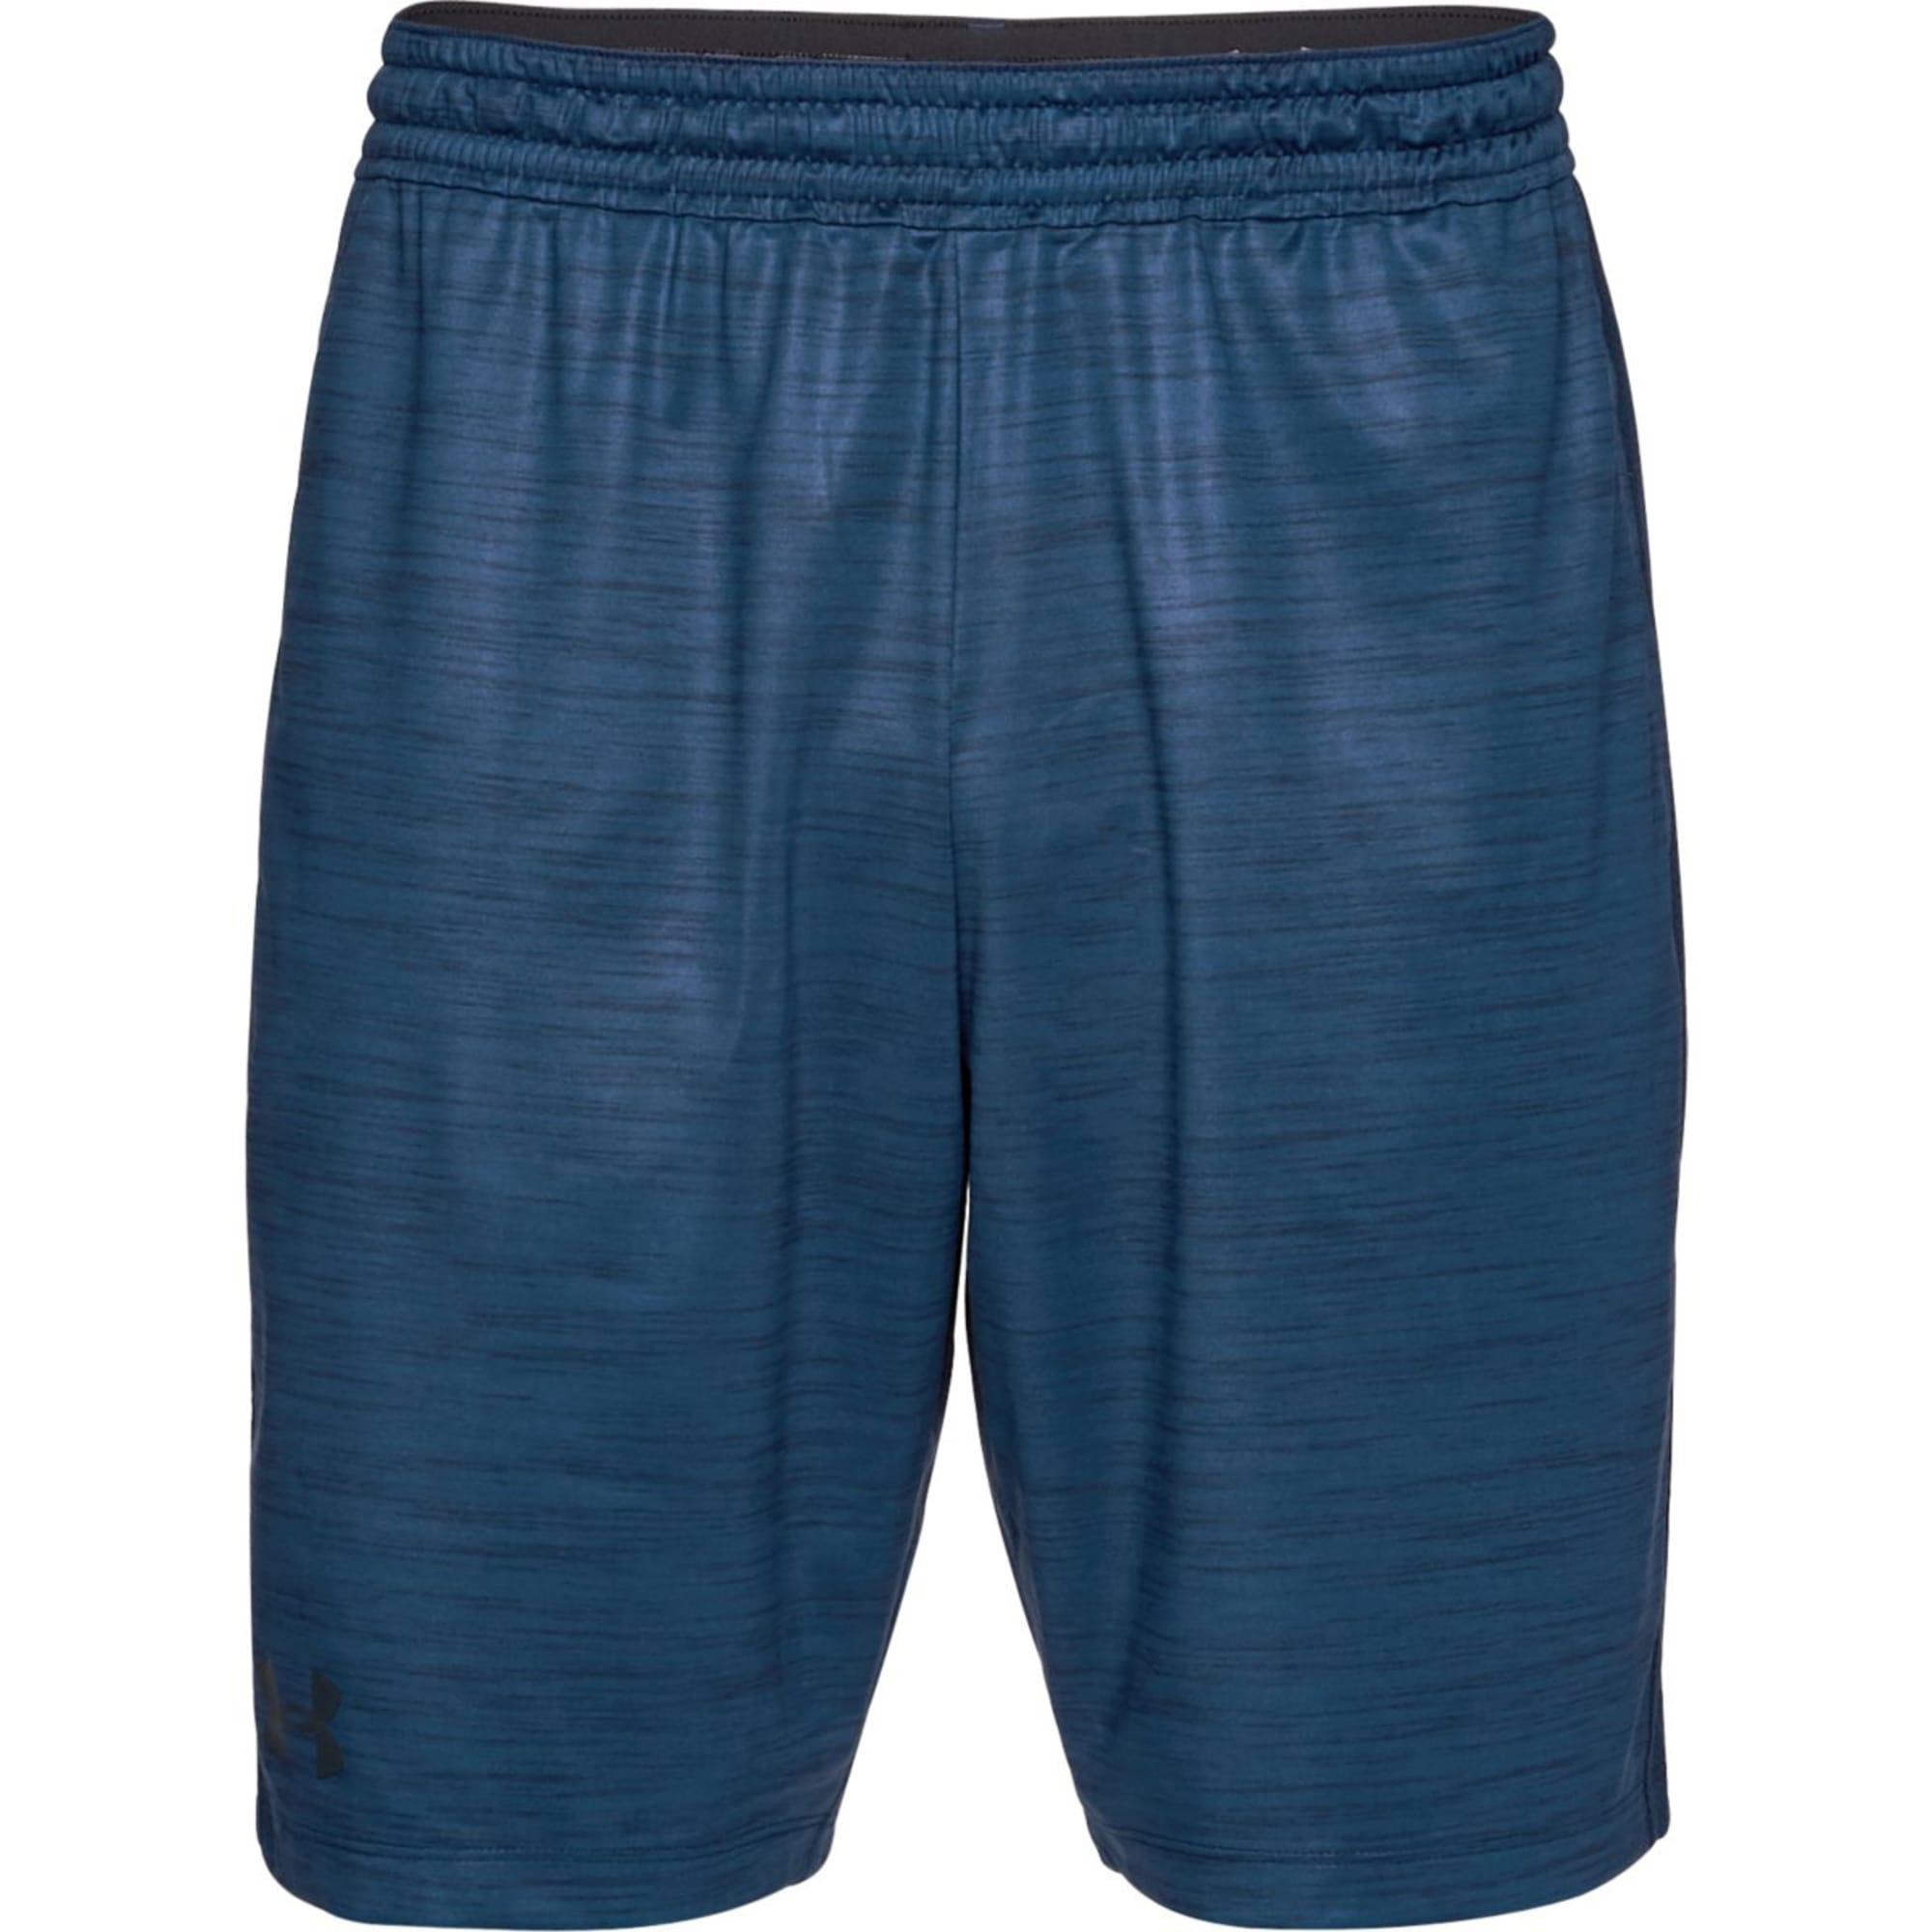 19d0e3e19d UNDER ARMOUR Men's 9 in. UA MK1 Twist Shorts